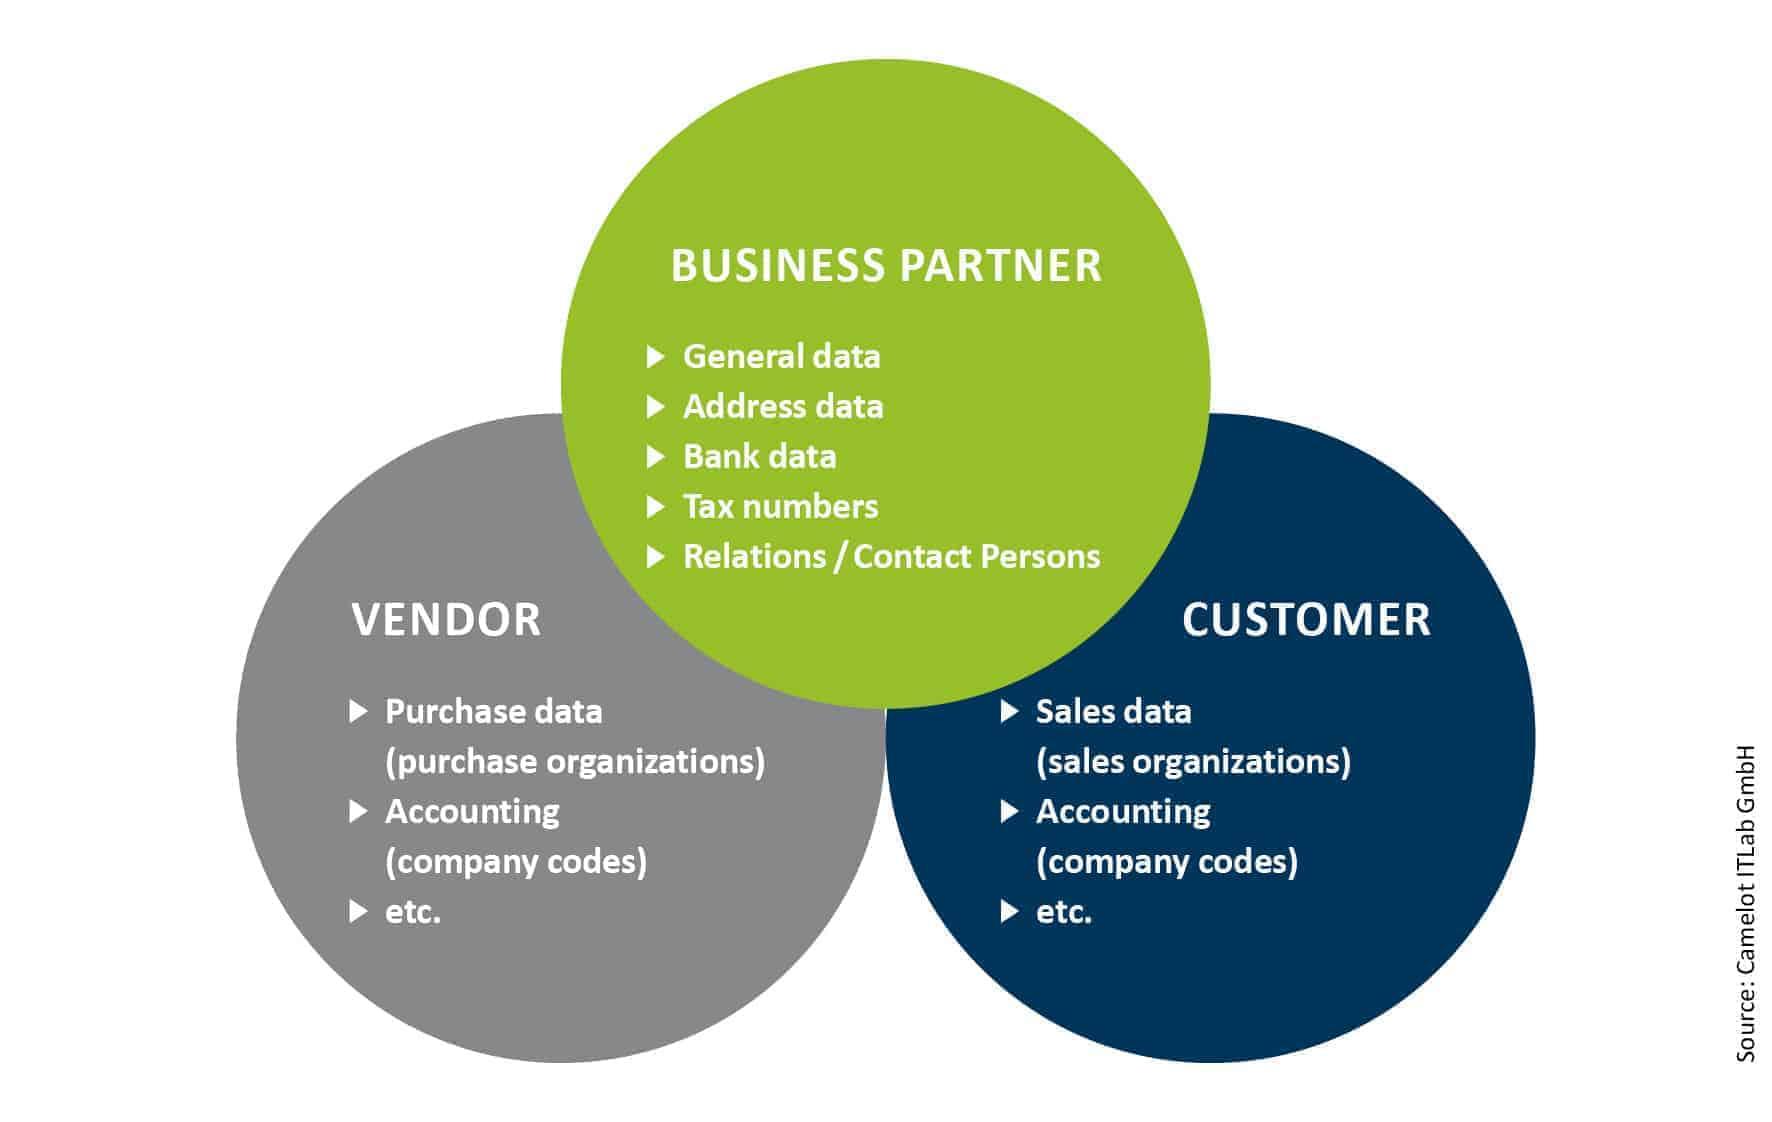 Does S/4Hana's Business Partner Approach Revolutionize MDM?